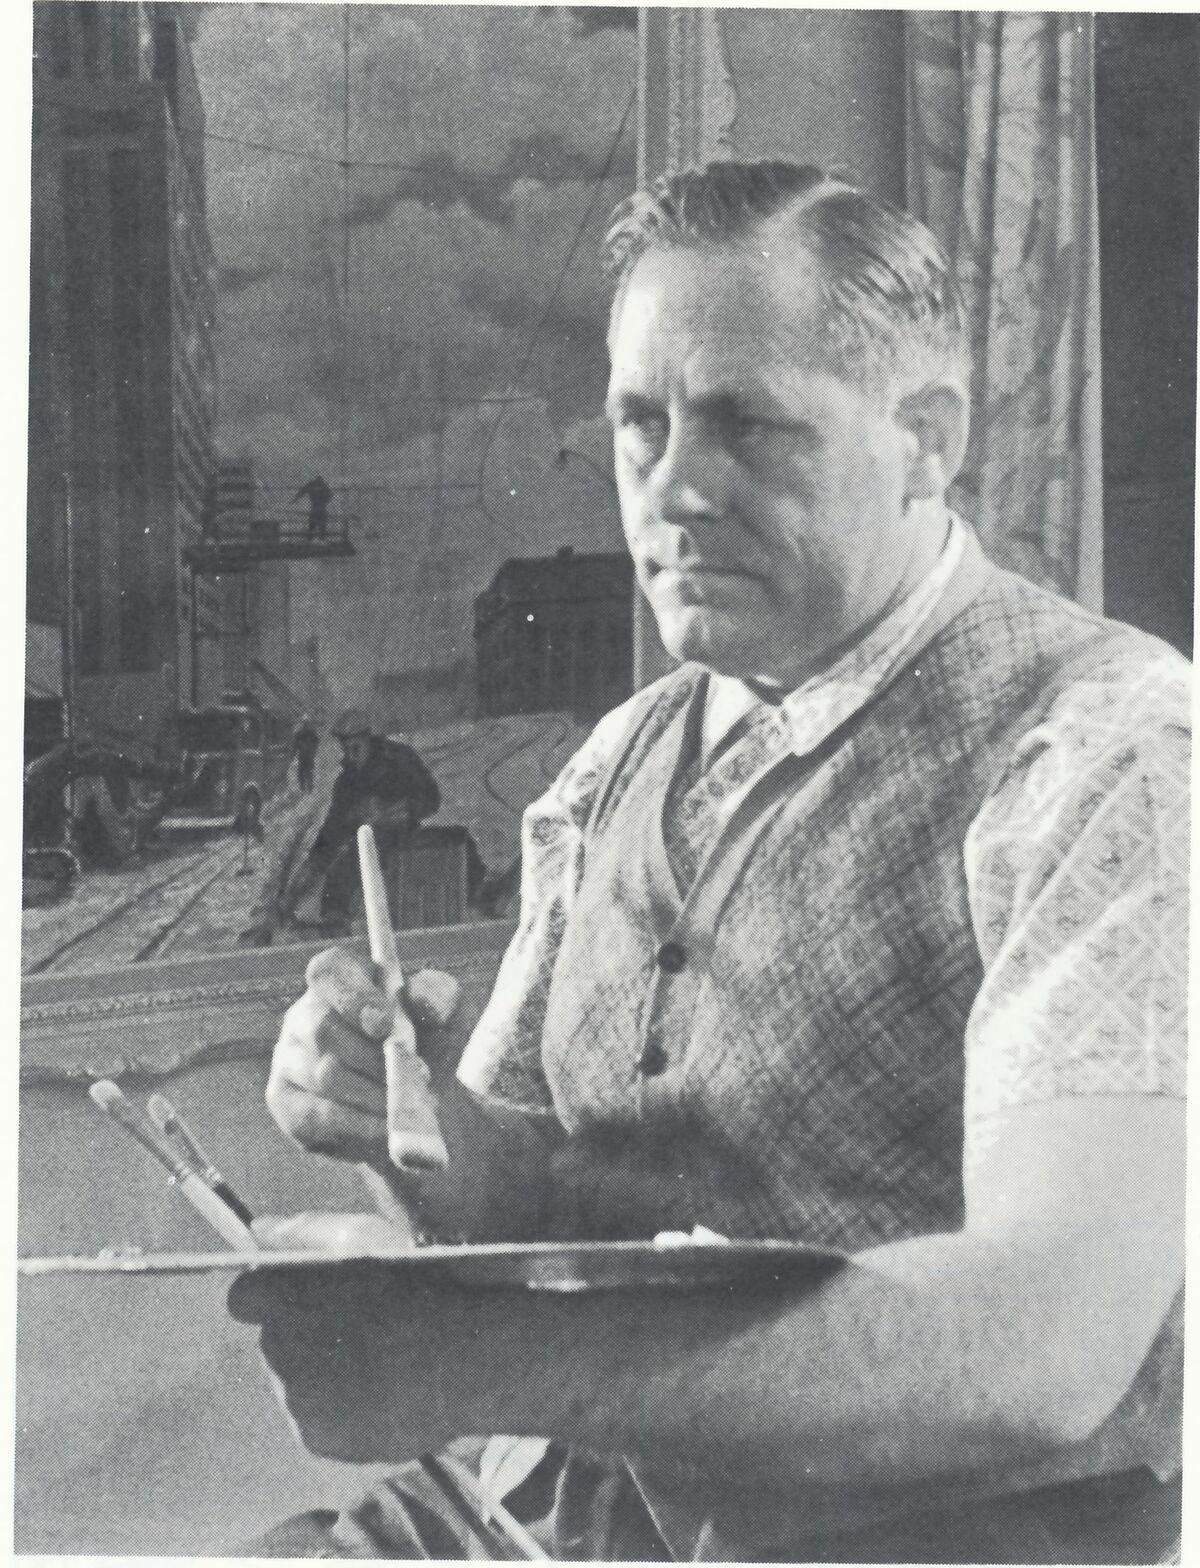 Portrait of Bill. Courtesy of Alexander Art.